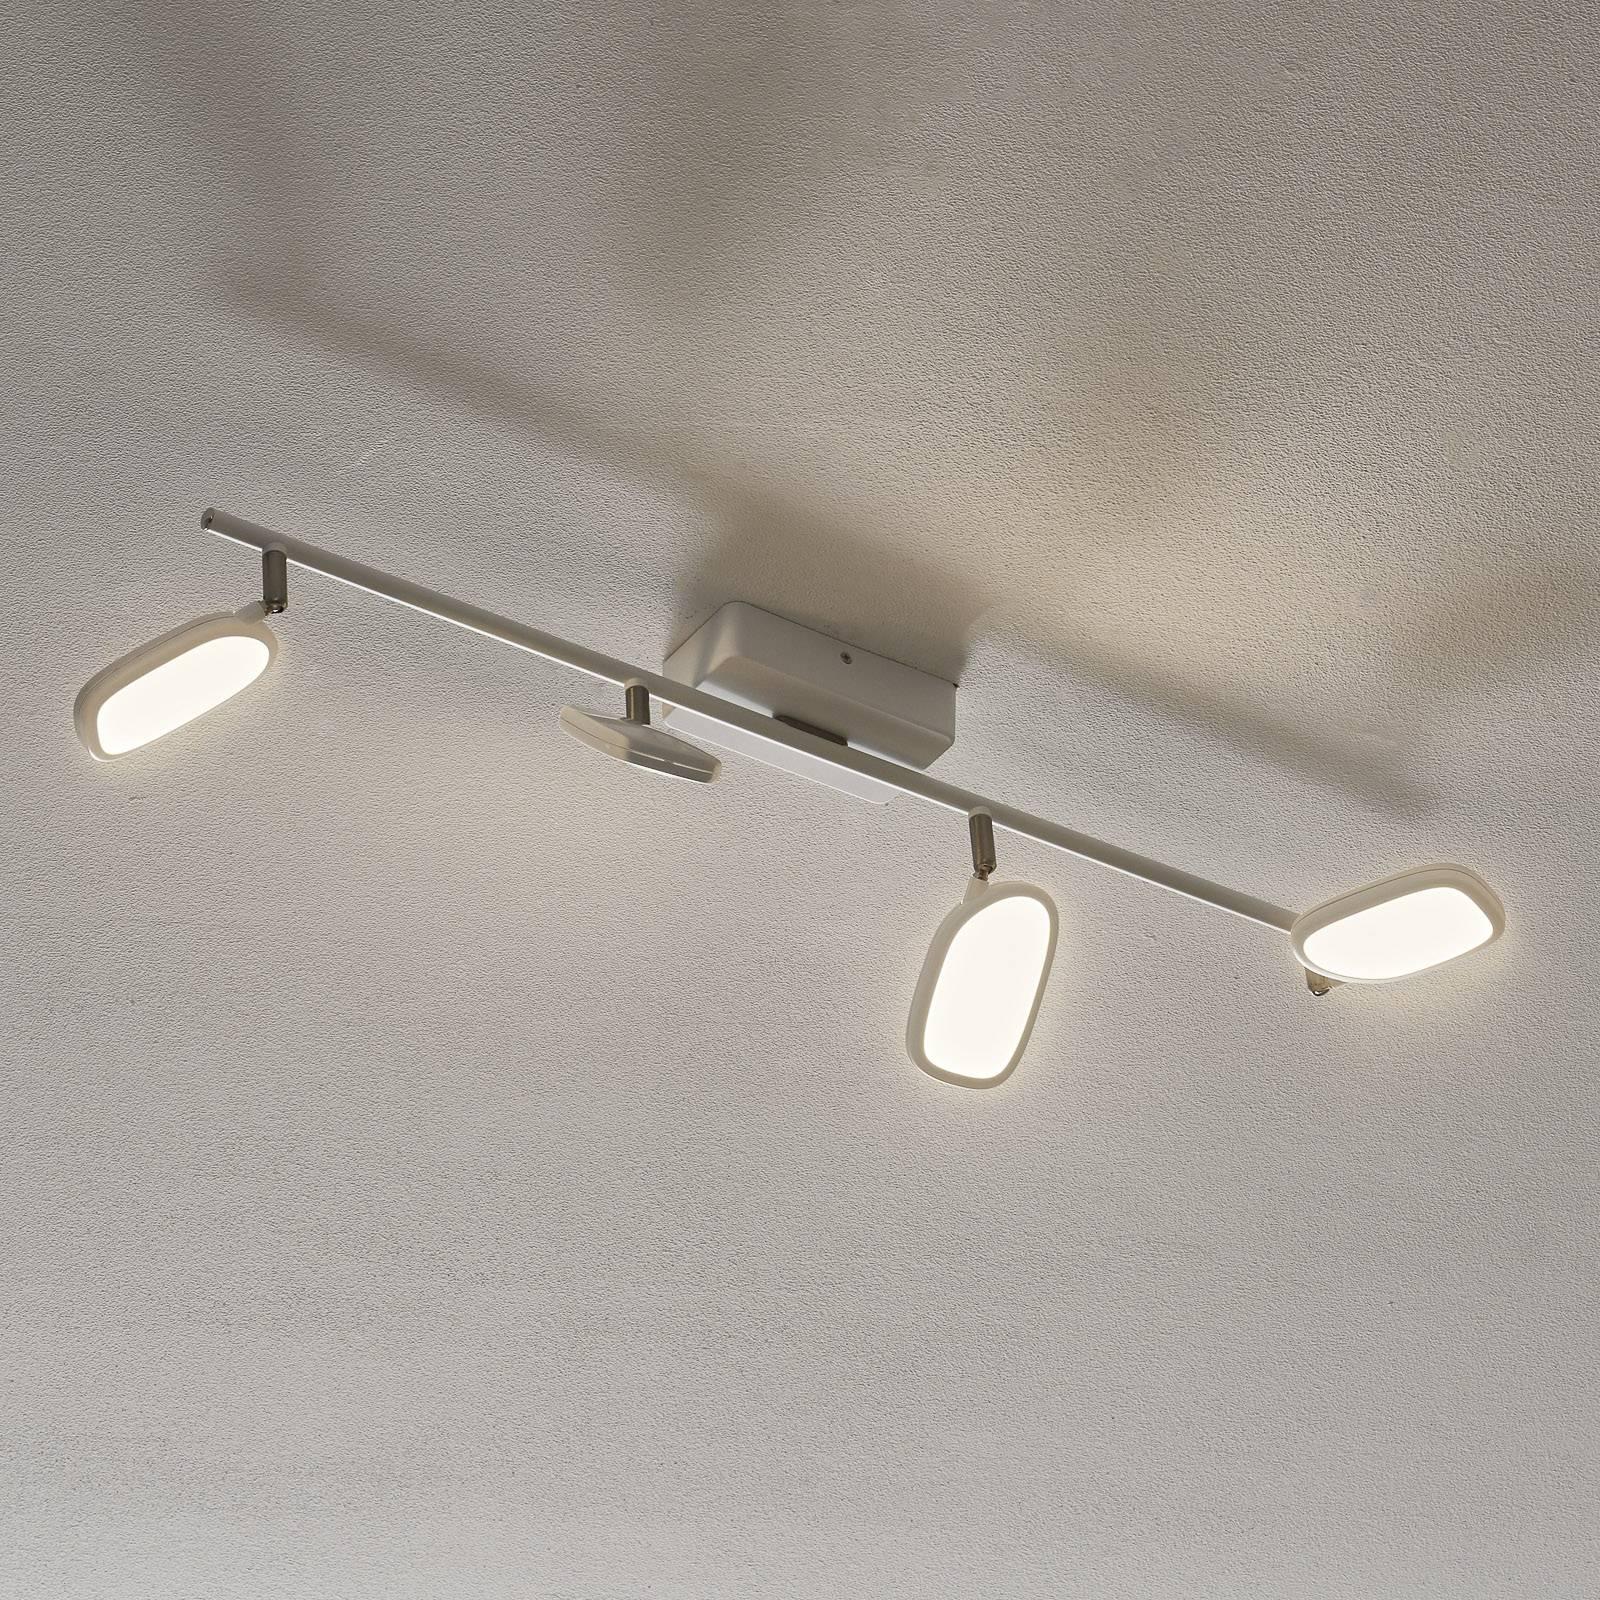 EGLO connect Palombare-C LED plafondlamp 4-lamps